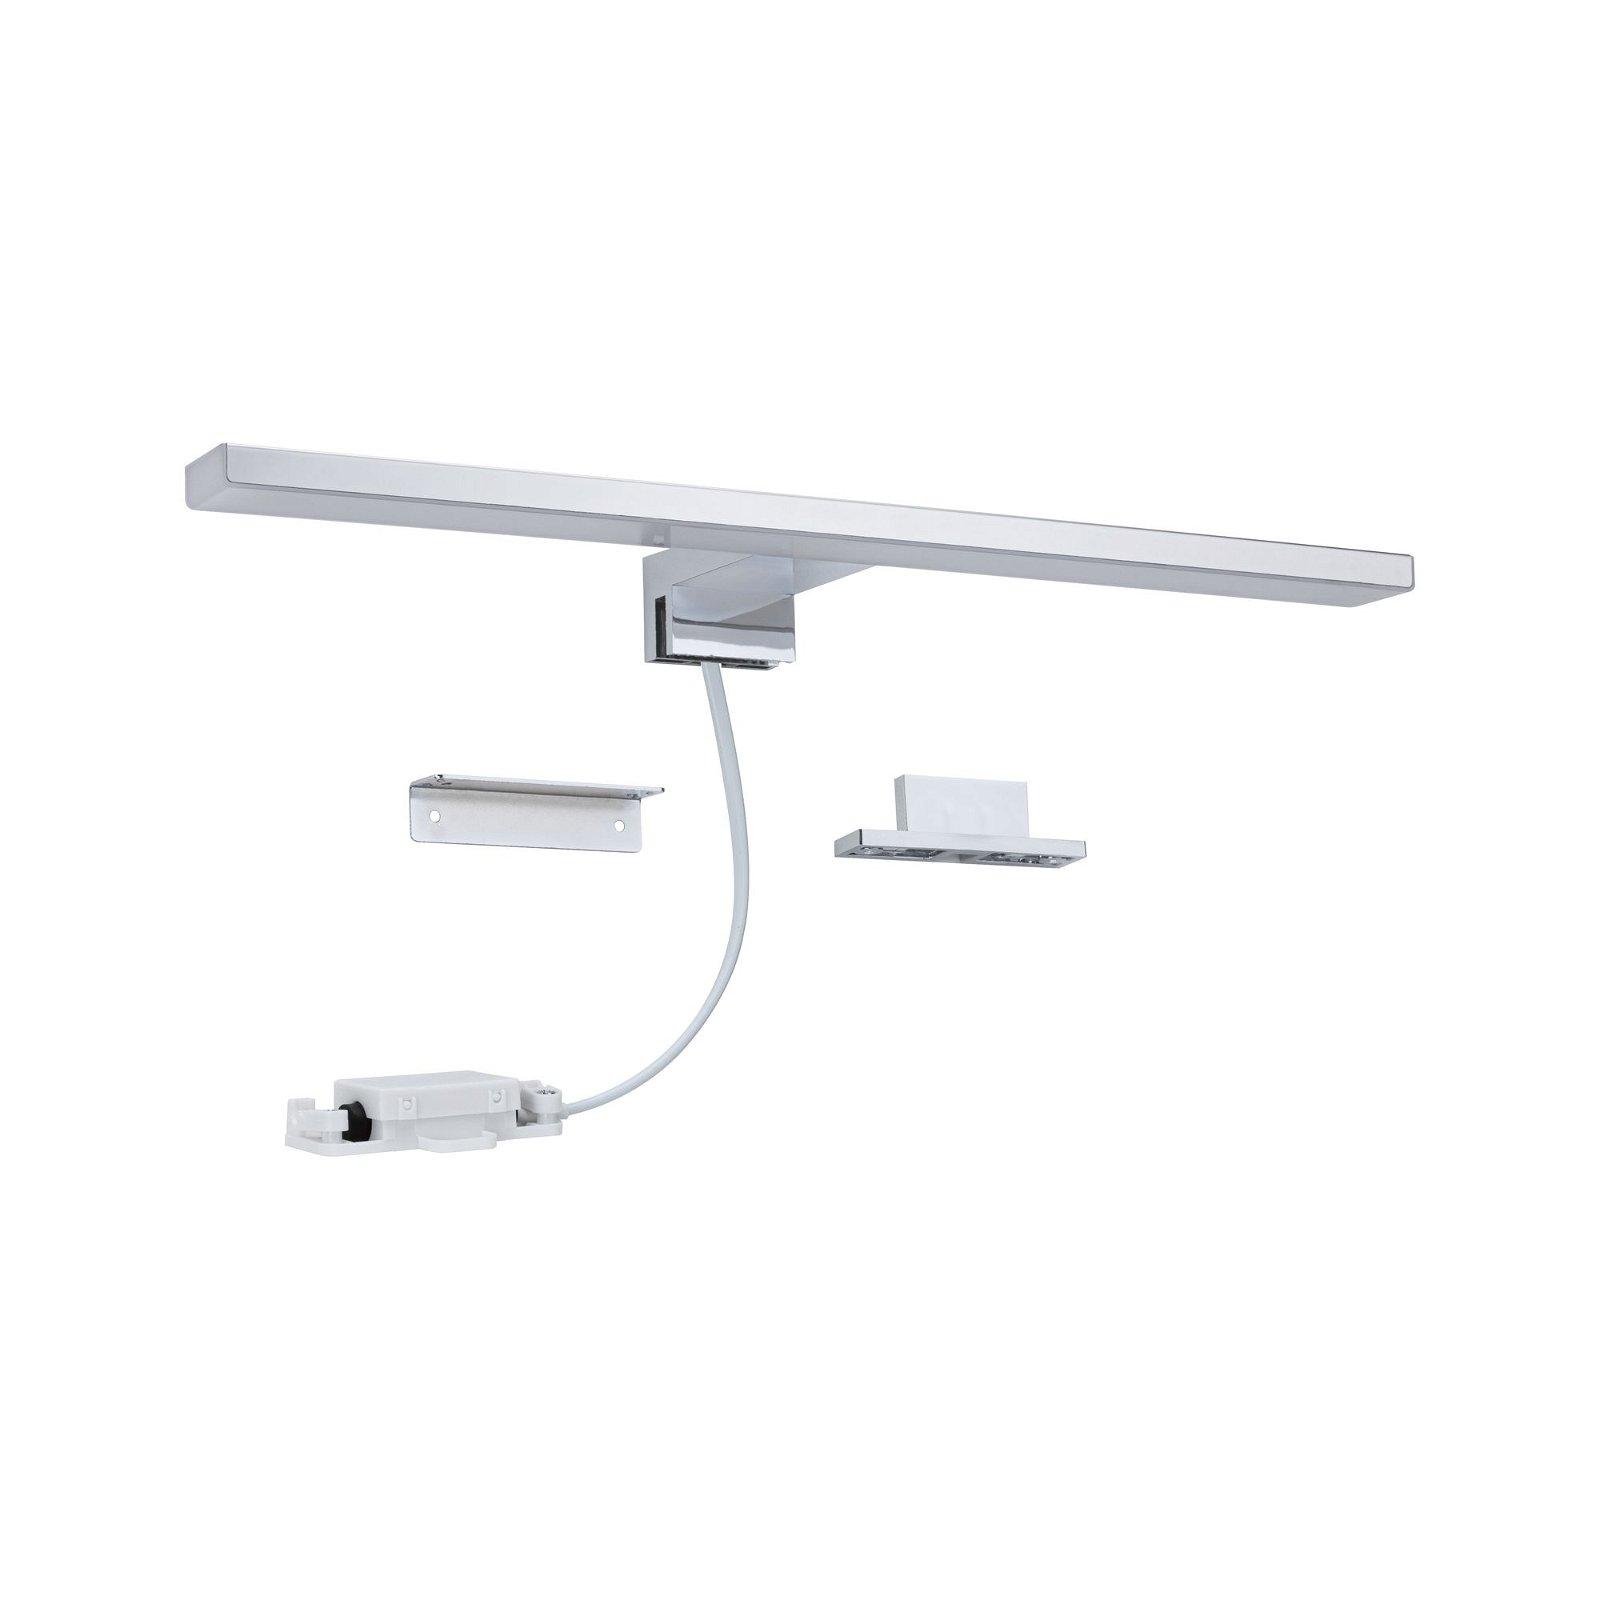 HomeSpa LED Spiegelleuchte Evie IP44 3000K 1050lm 230V 8,0W Chrom